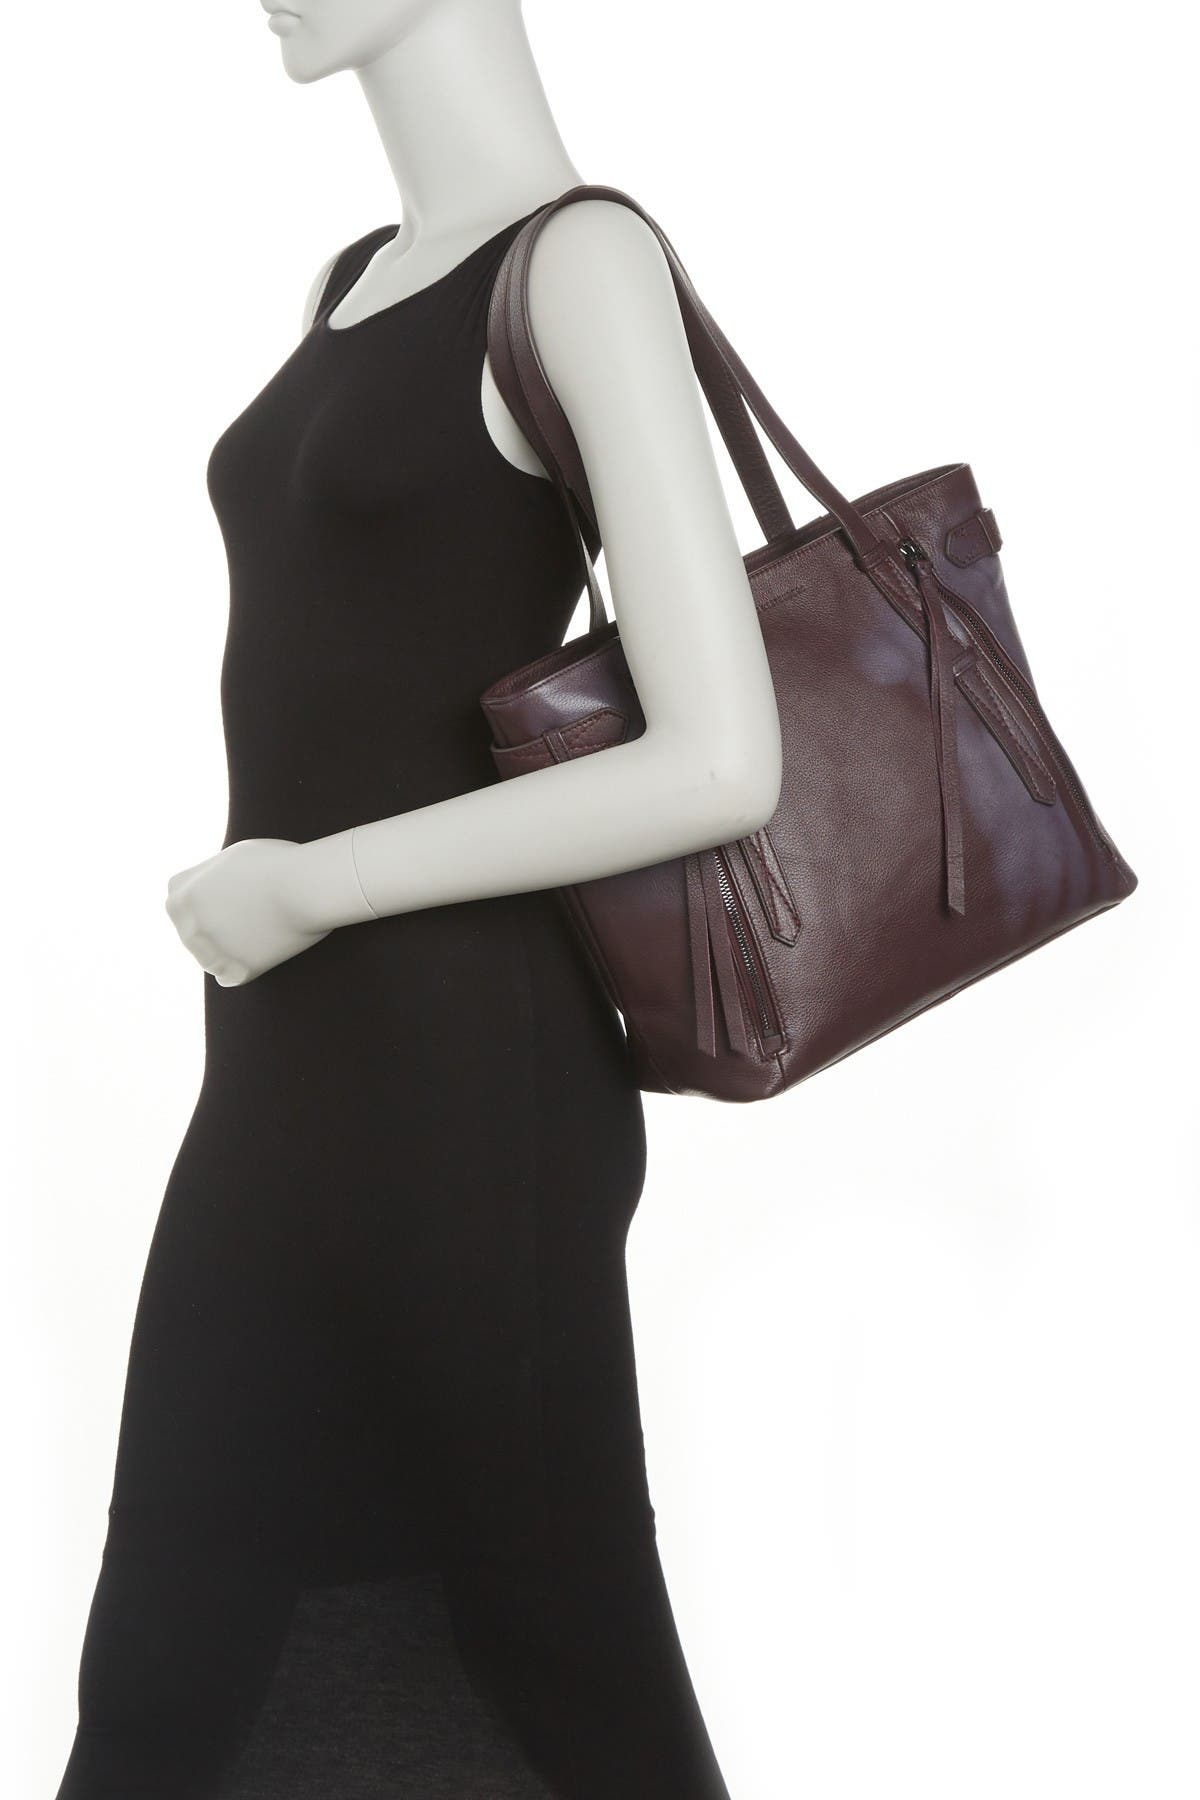 Image of Aimee Kestenberg City Slicker Leather Tote Bag